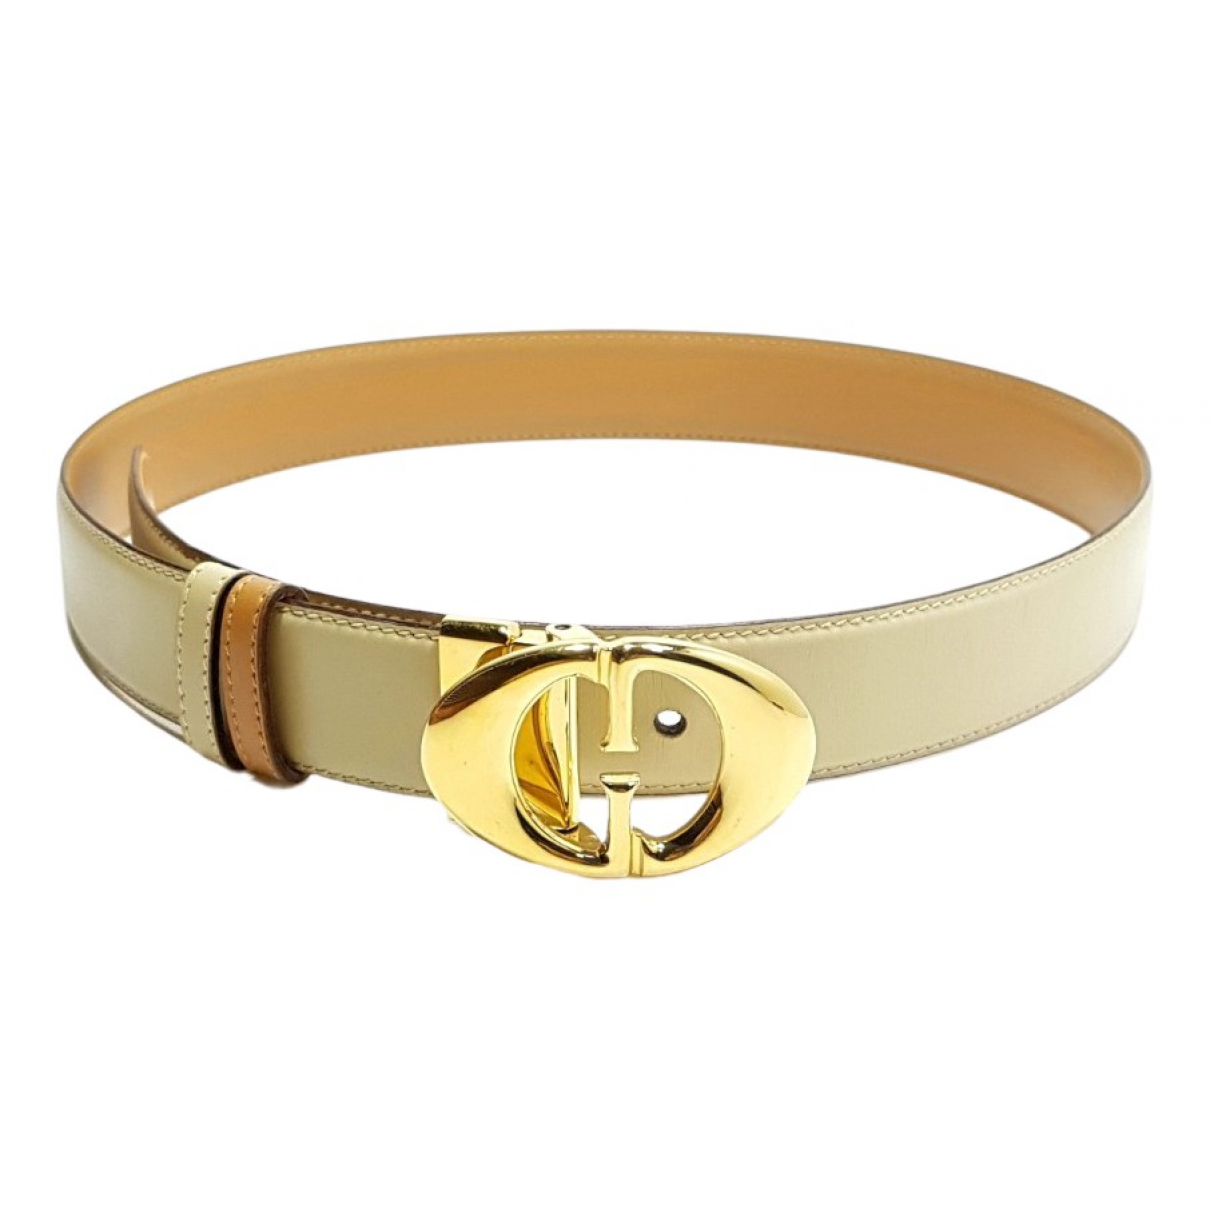 Gucci Interlocking Buckle Beige Leather belt for Women 27 Inches